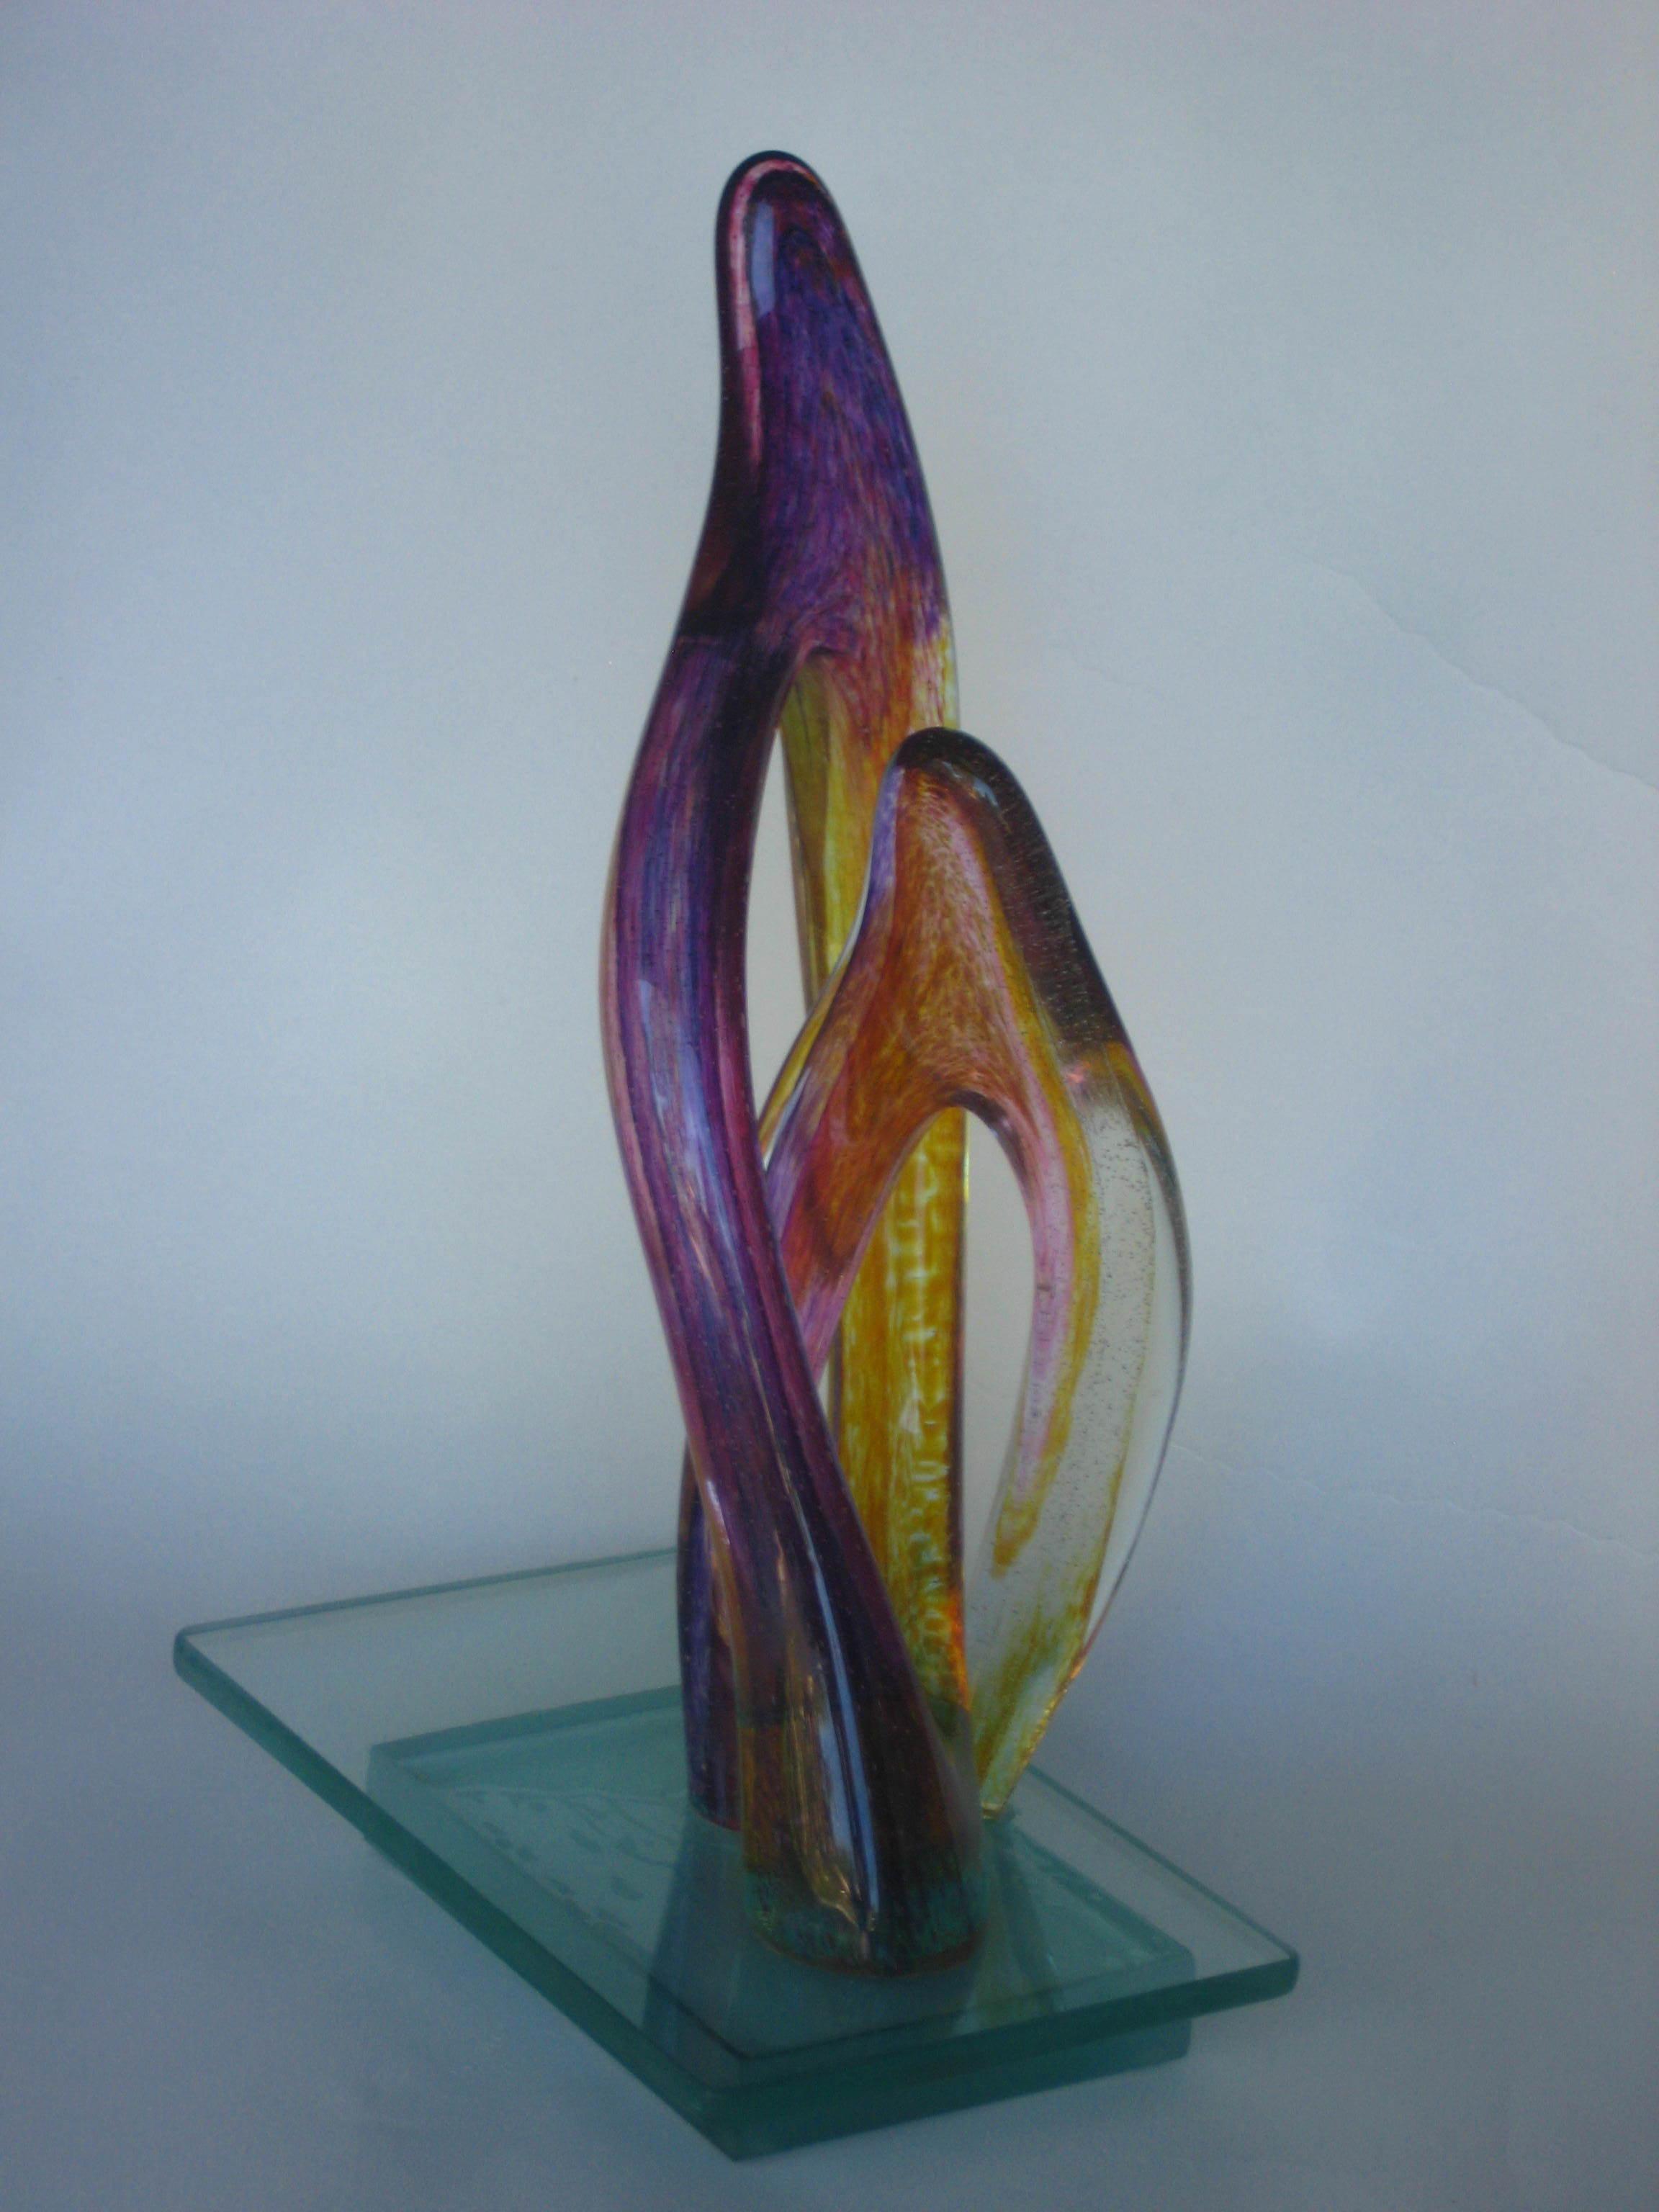 faridehsculpture.JPG